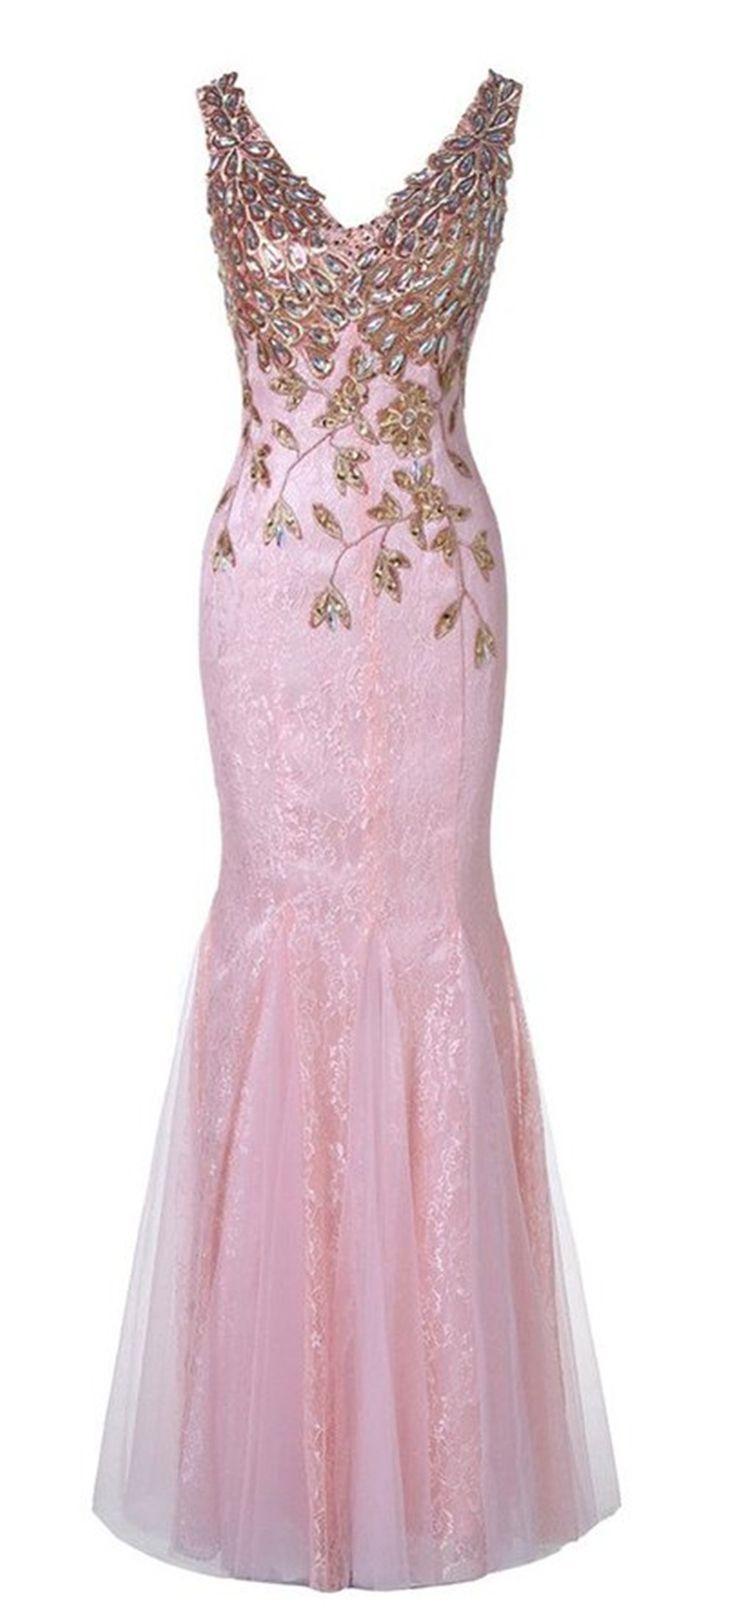 18 best Dama images on Pinterest | Formal prom dresses, Cute dresses ...